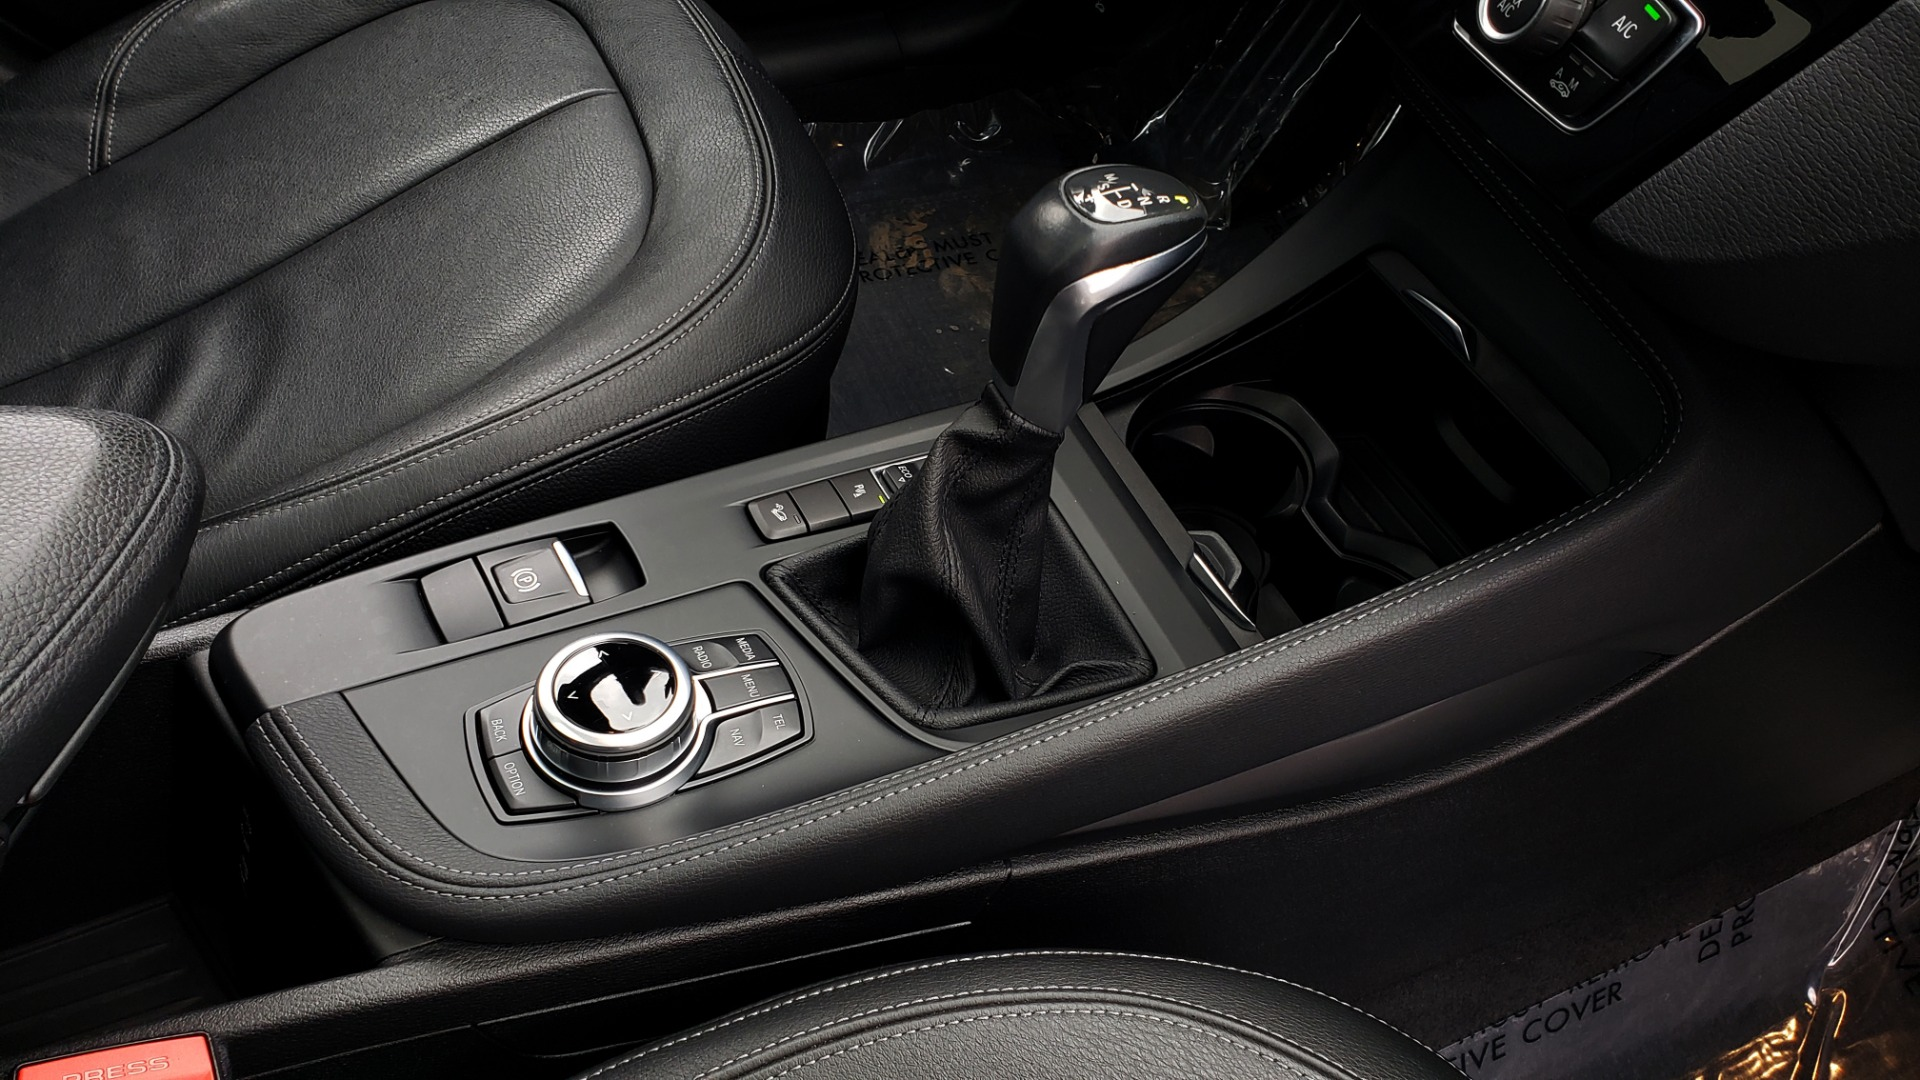 Used 2017 BMW X1 XDRIVE28I / PREM PKG / DRIVER ASST / NAV / CLD WTHR for sale Sold at Formula Imports in Charlotte NC 28227 71